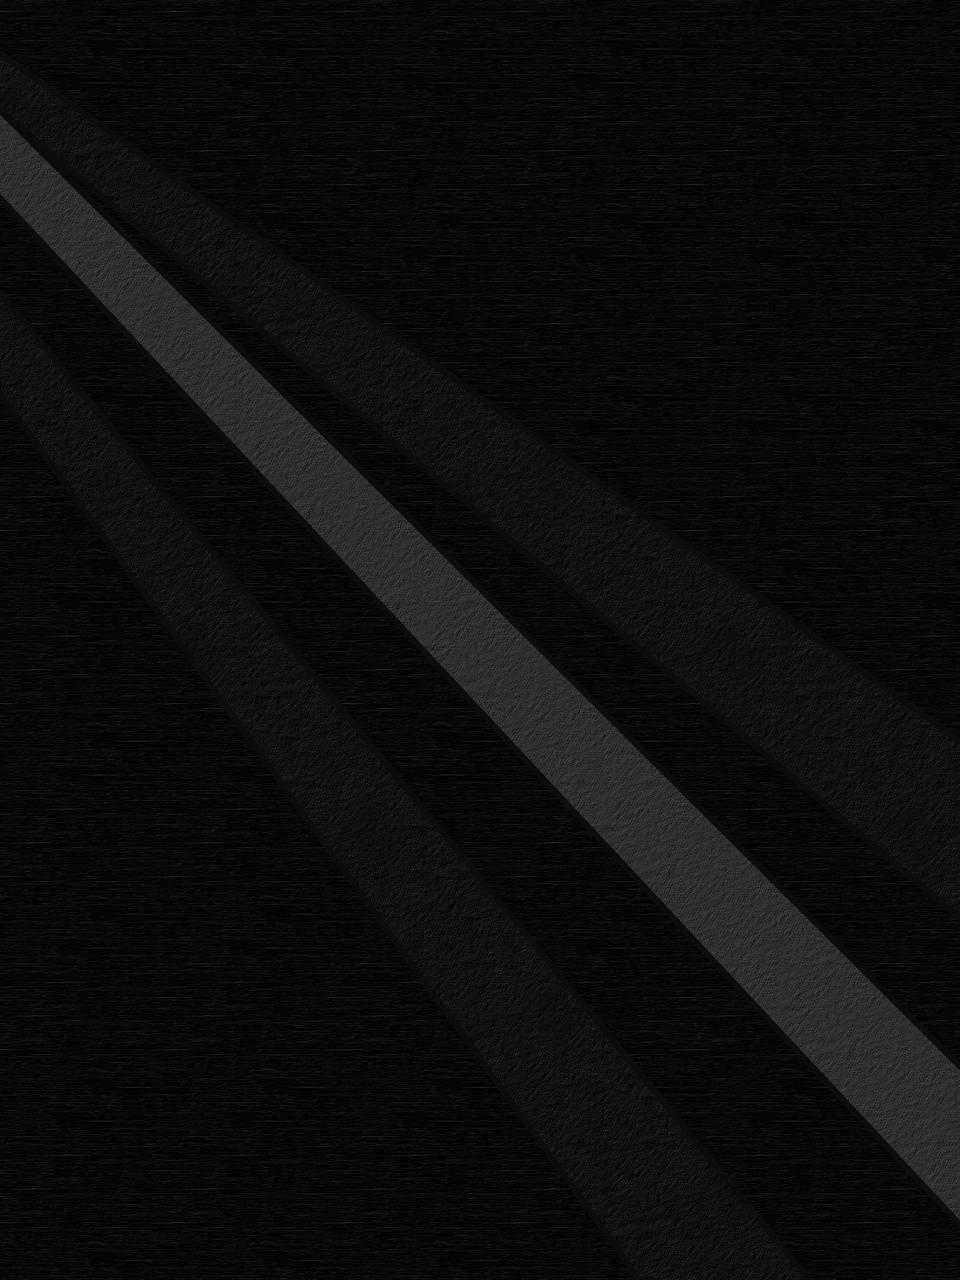 Dark HQ Wallpaper